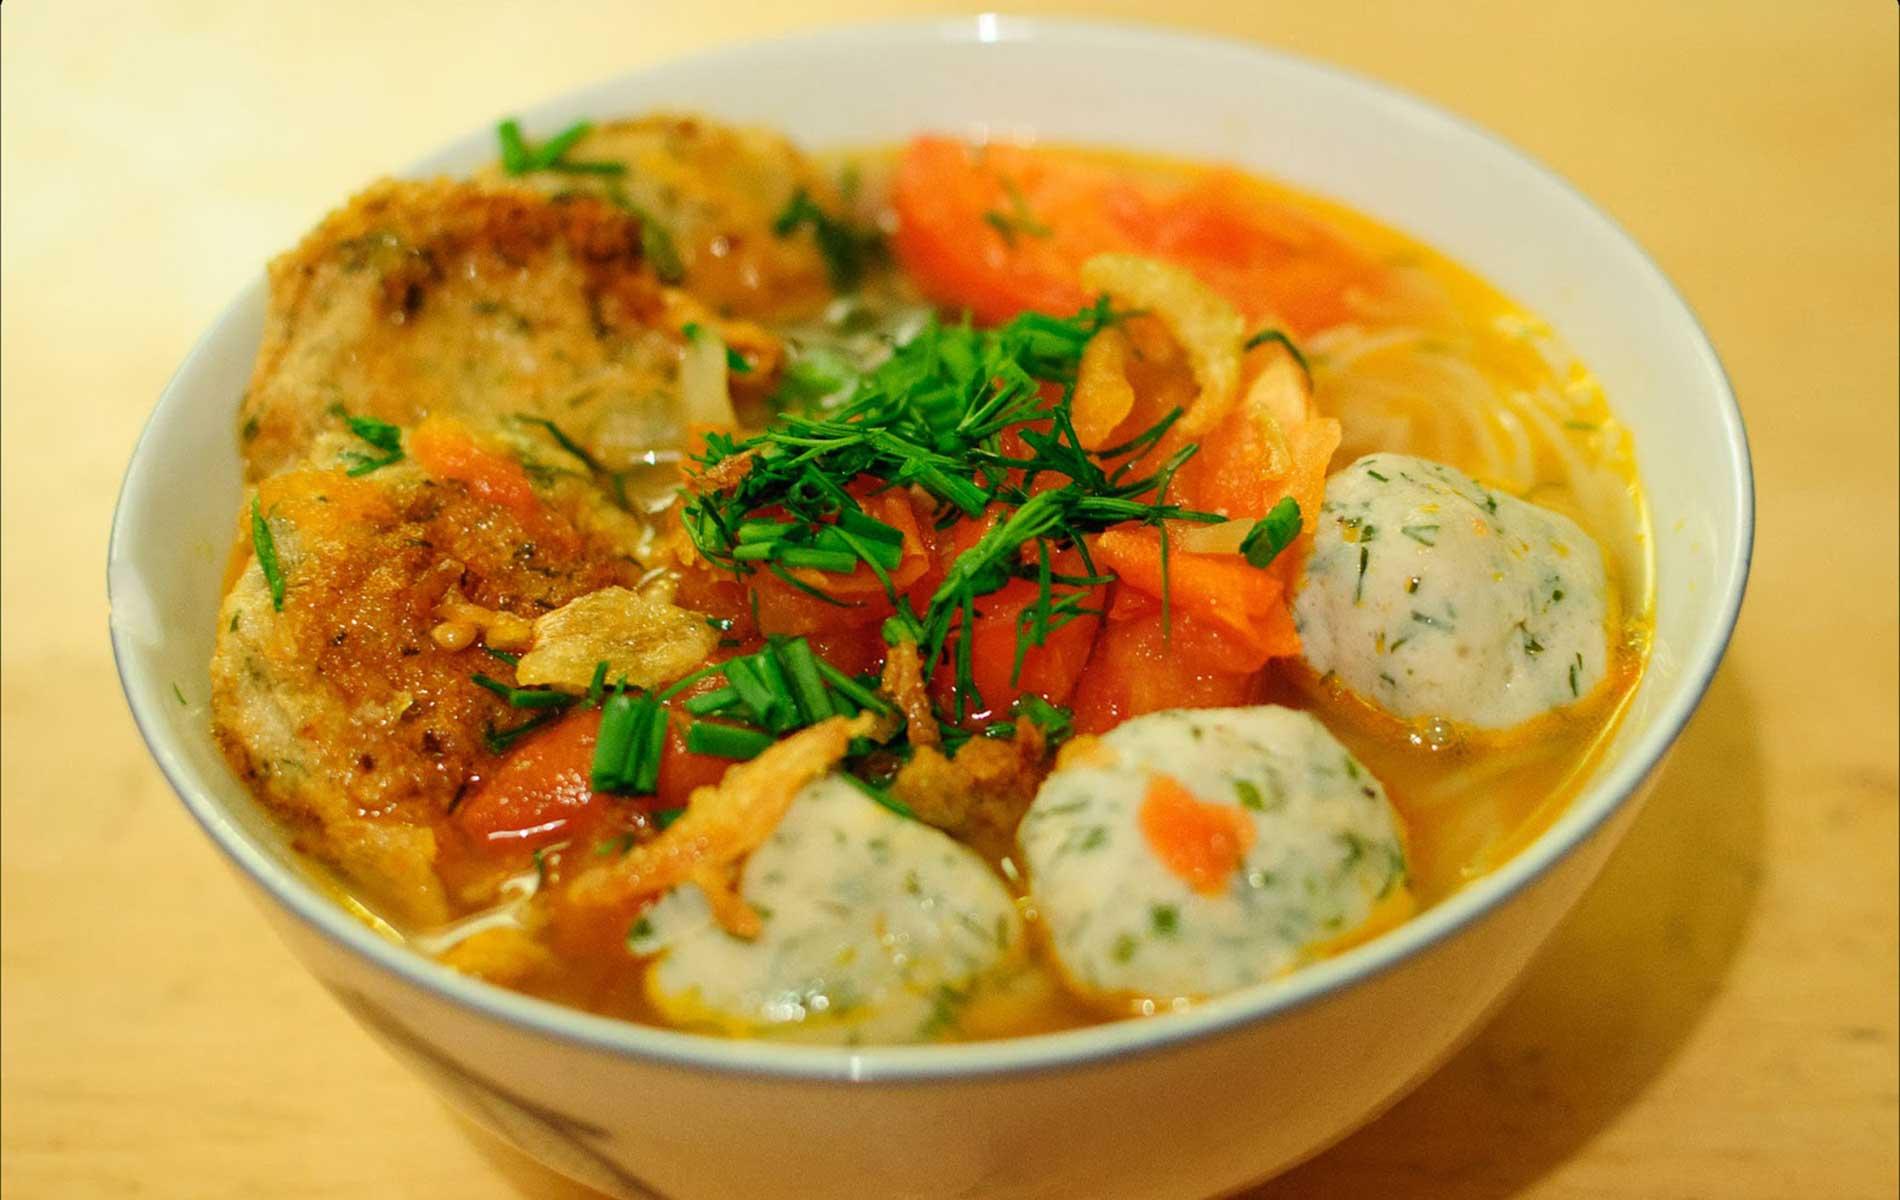 Fish rolls noodle (Bún cá)